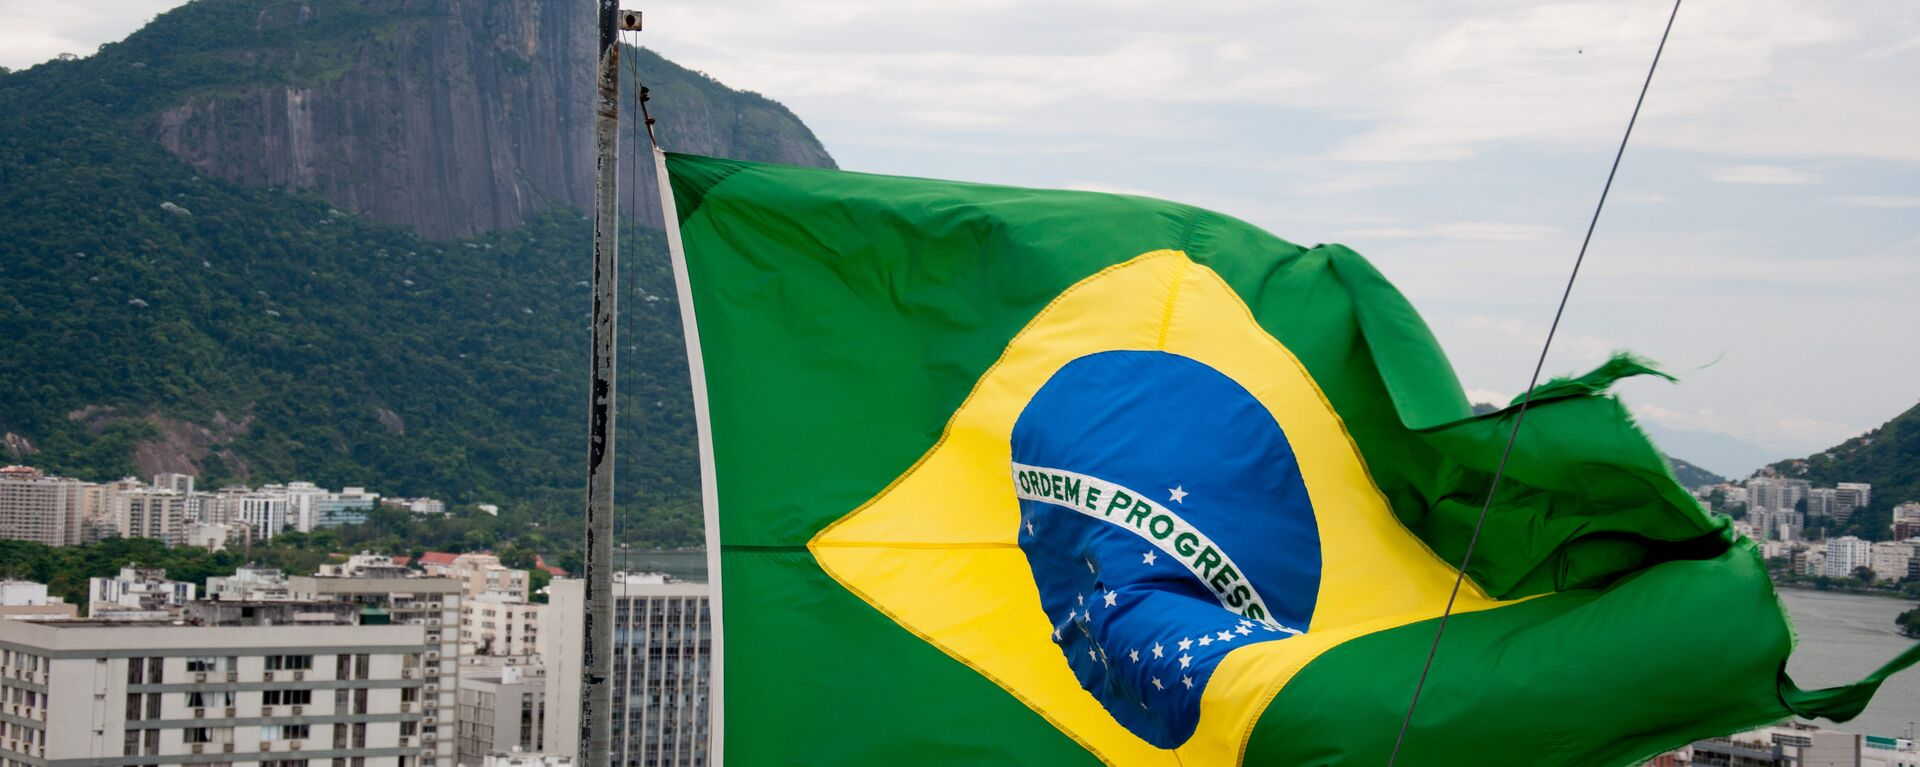 Bandera de Brasil  - Sputnik Mundo, 1920, 27.09.2021